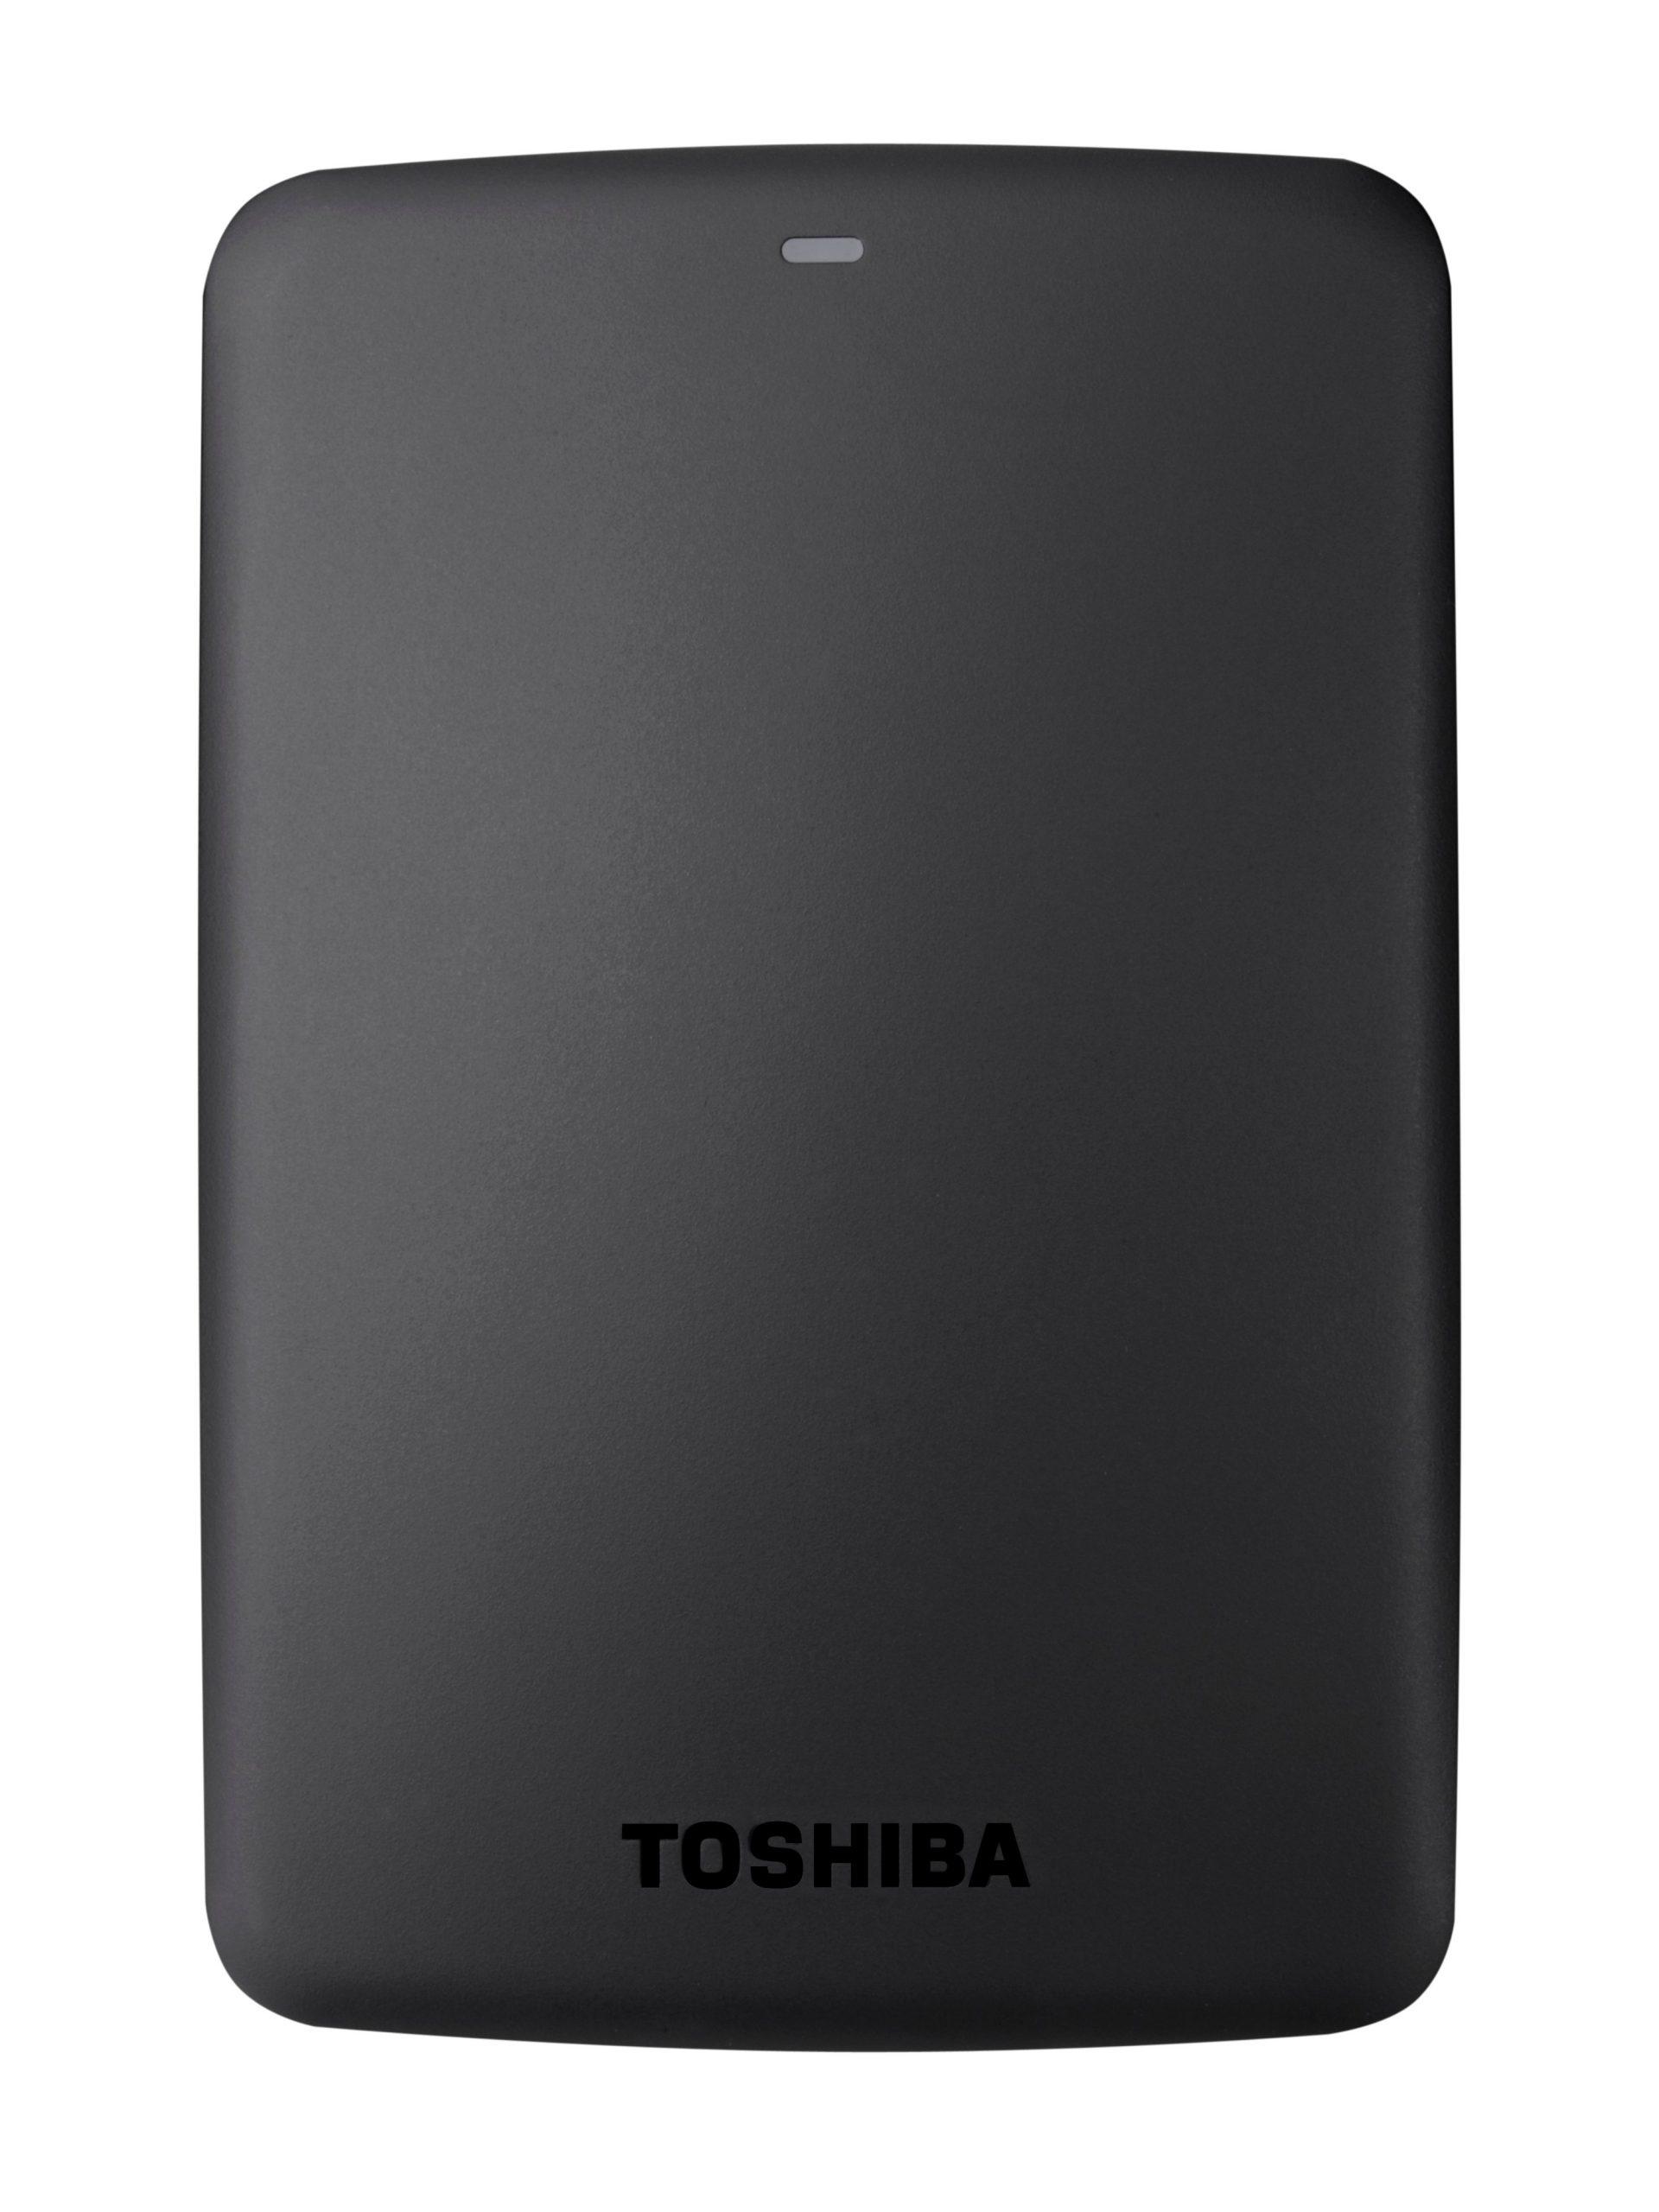 Toshiba Portatili Carrefour